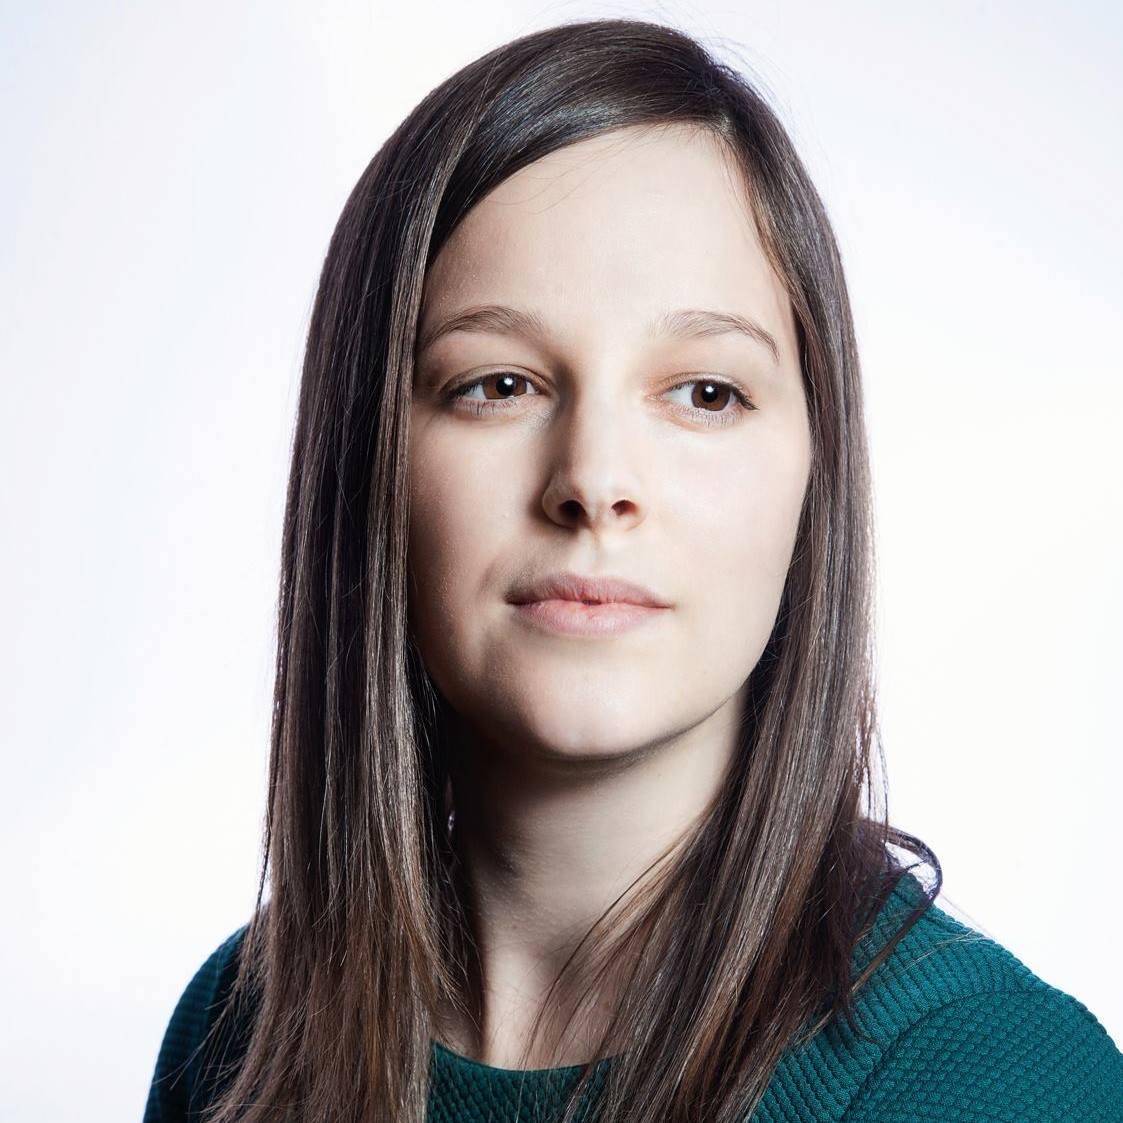 Andrée-Anne Giguère